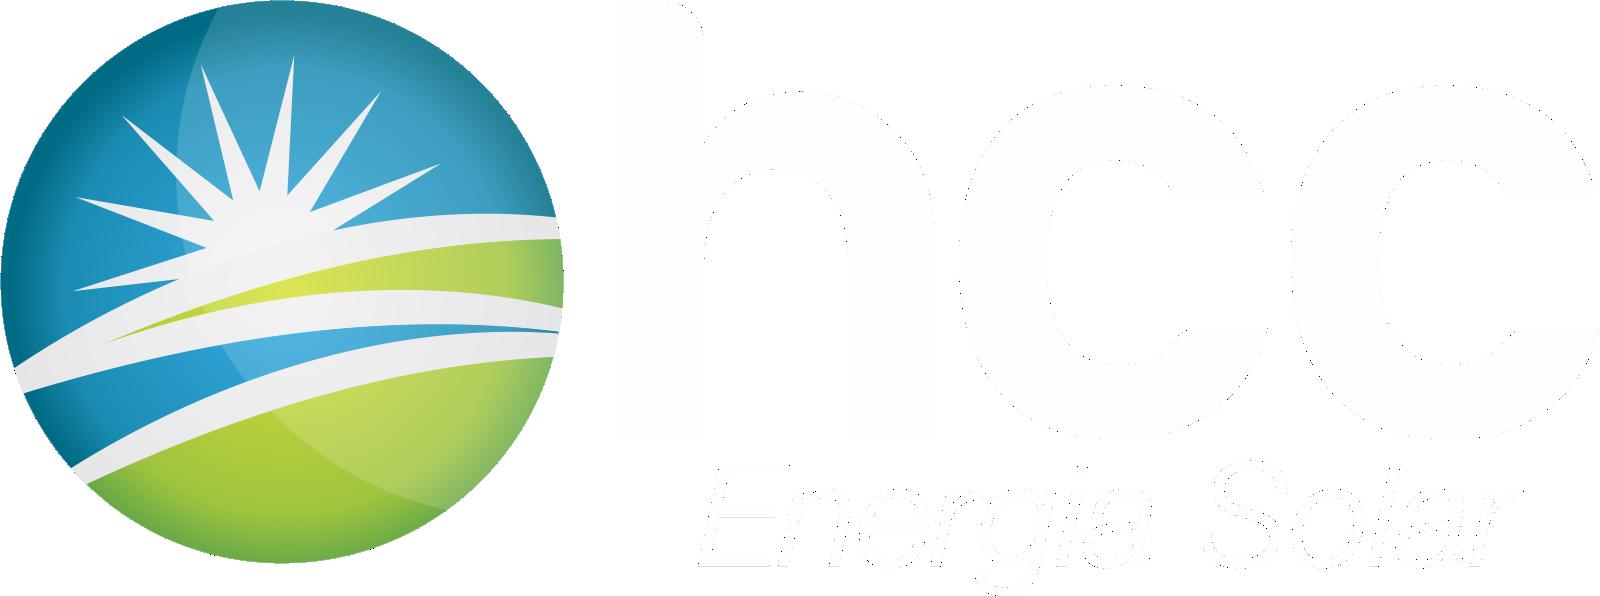 logo hcc energia solar para empresas